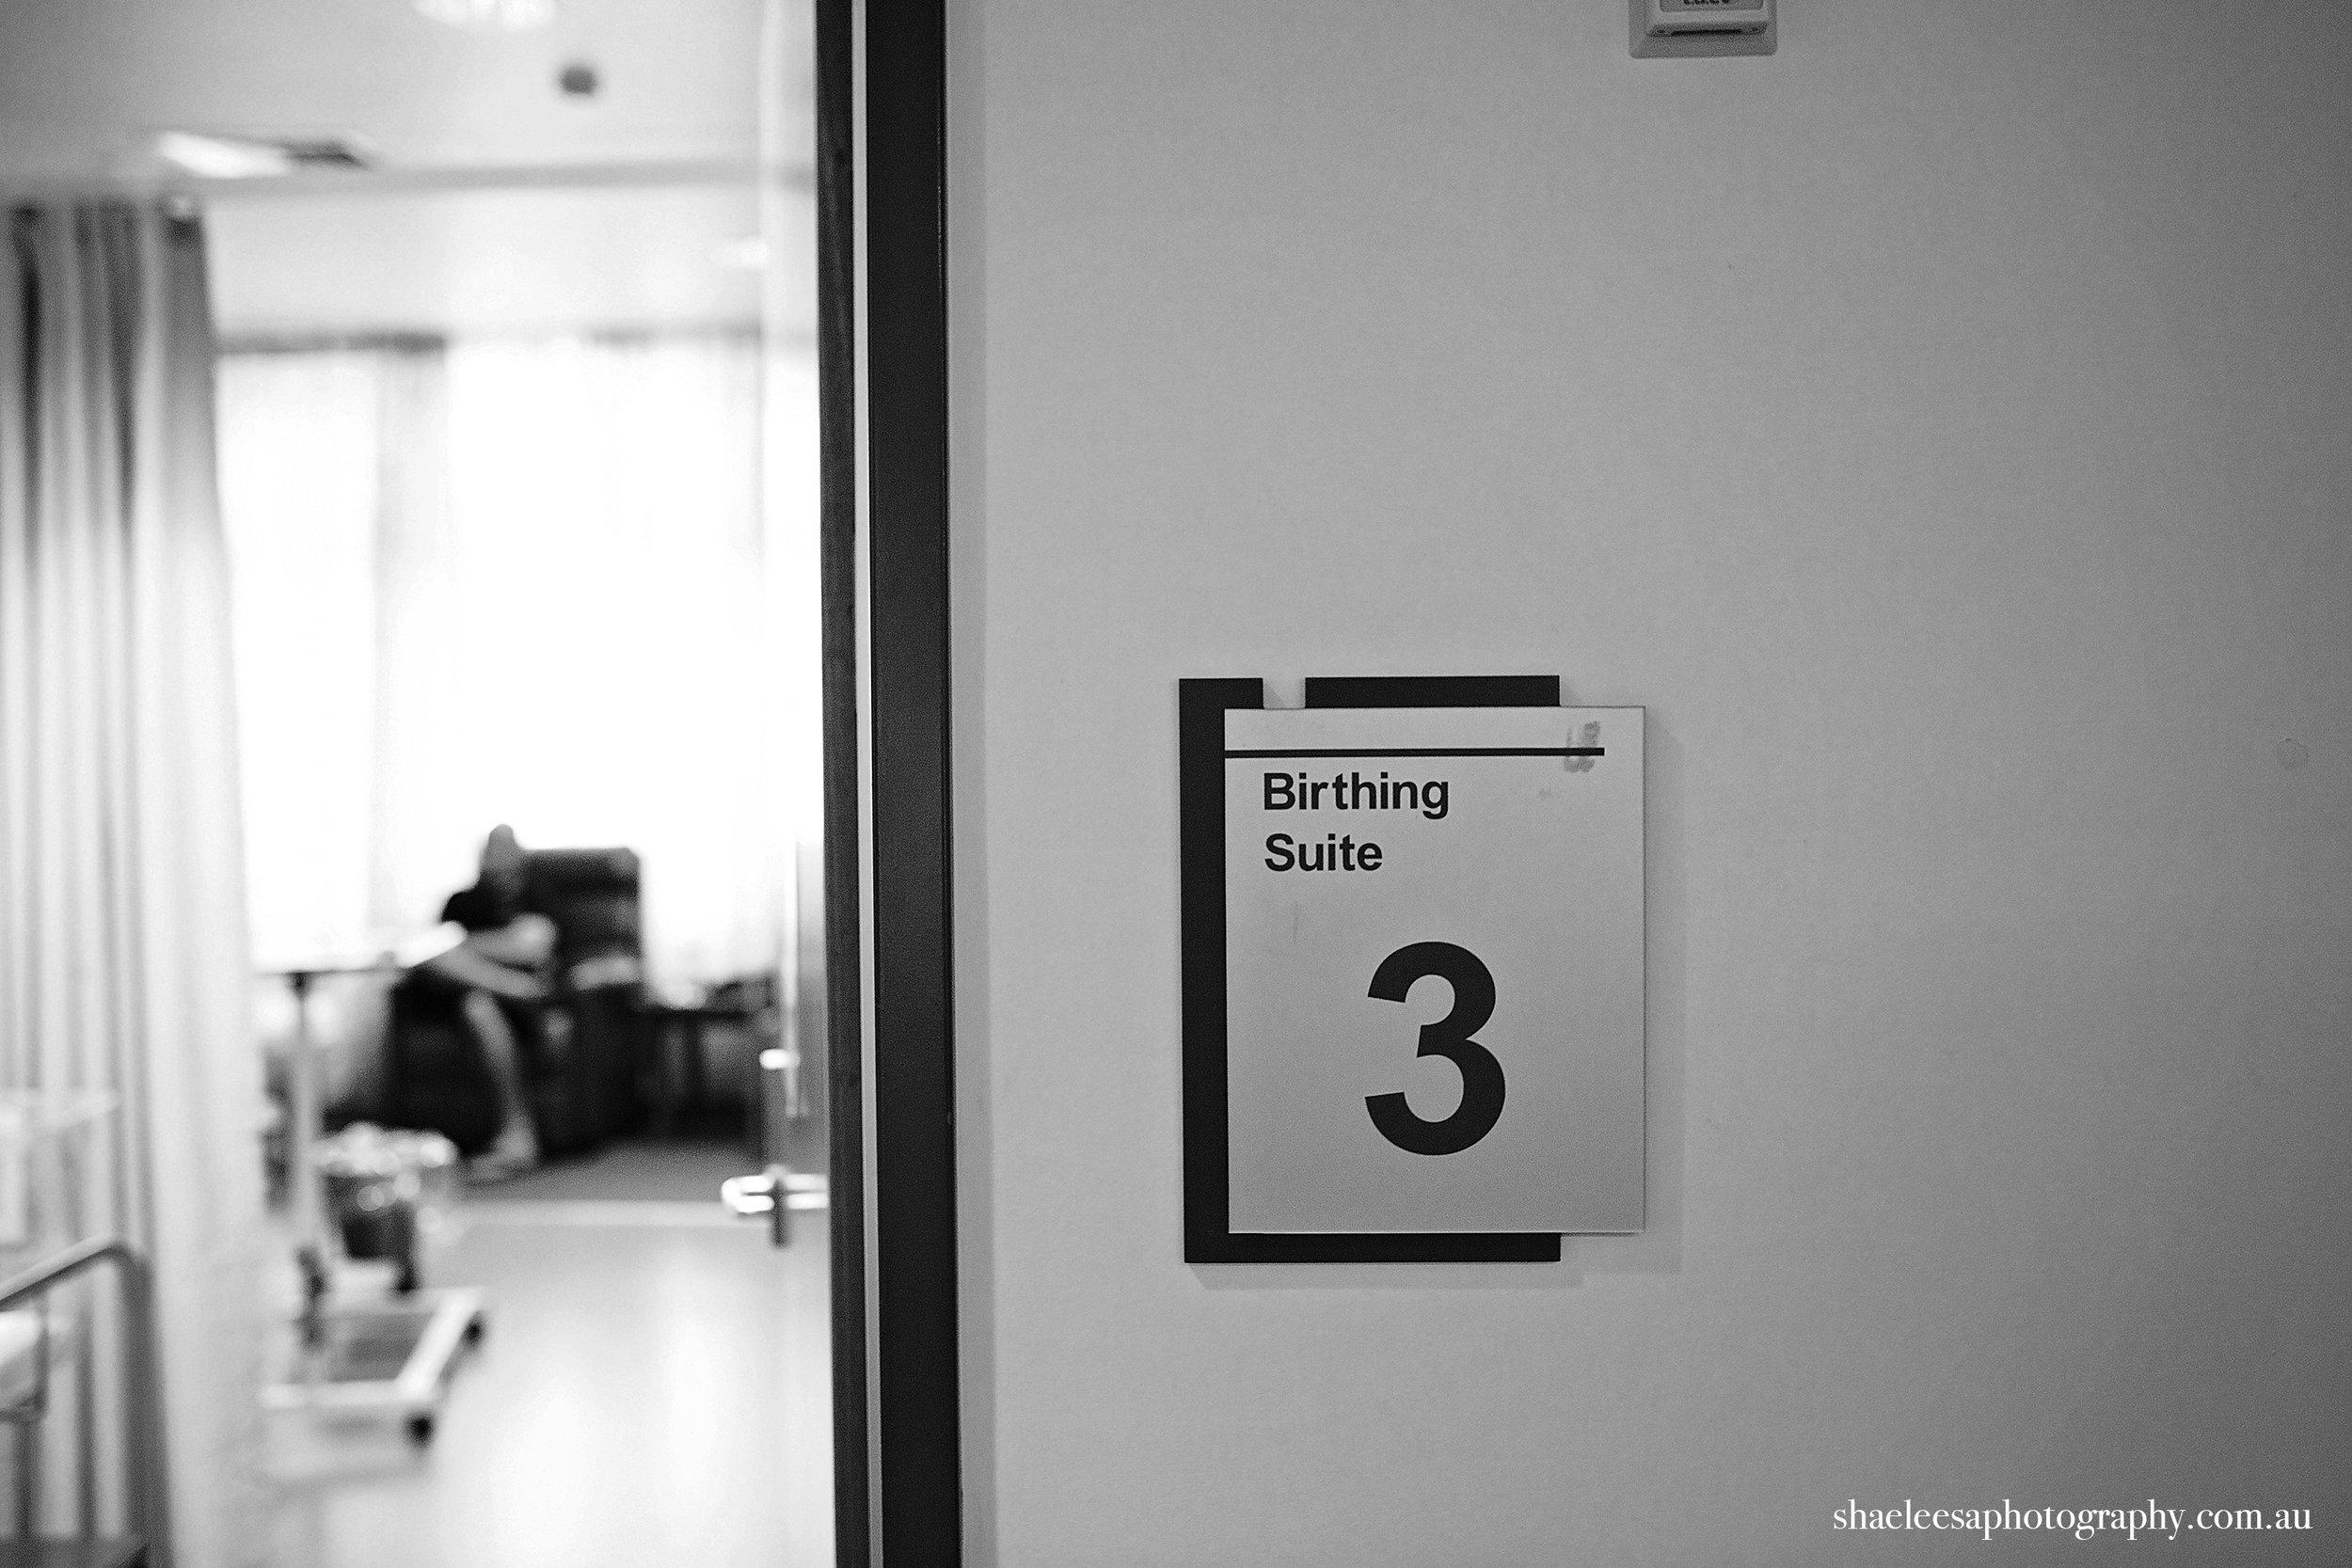 NeiblingBIRTH_002_ShaeLeesaPhotography_B&W.jpg